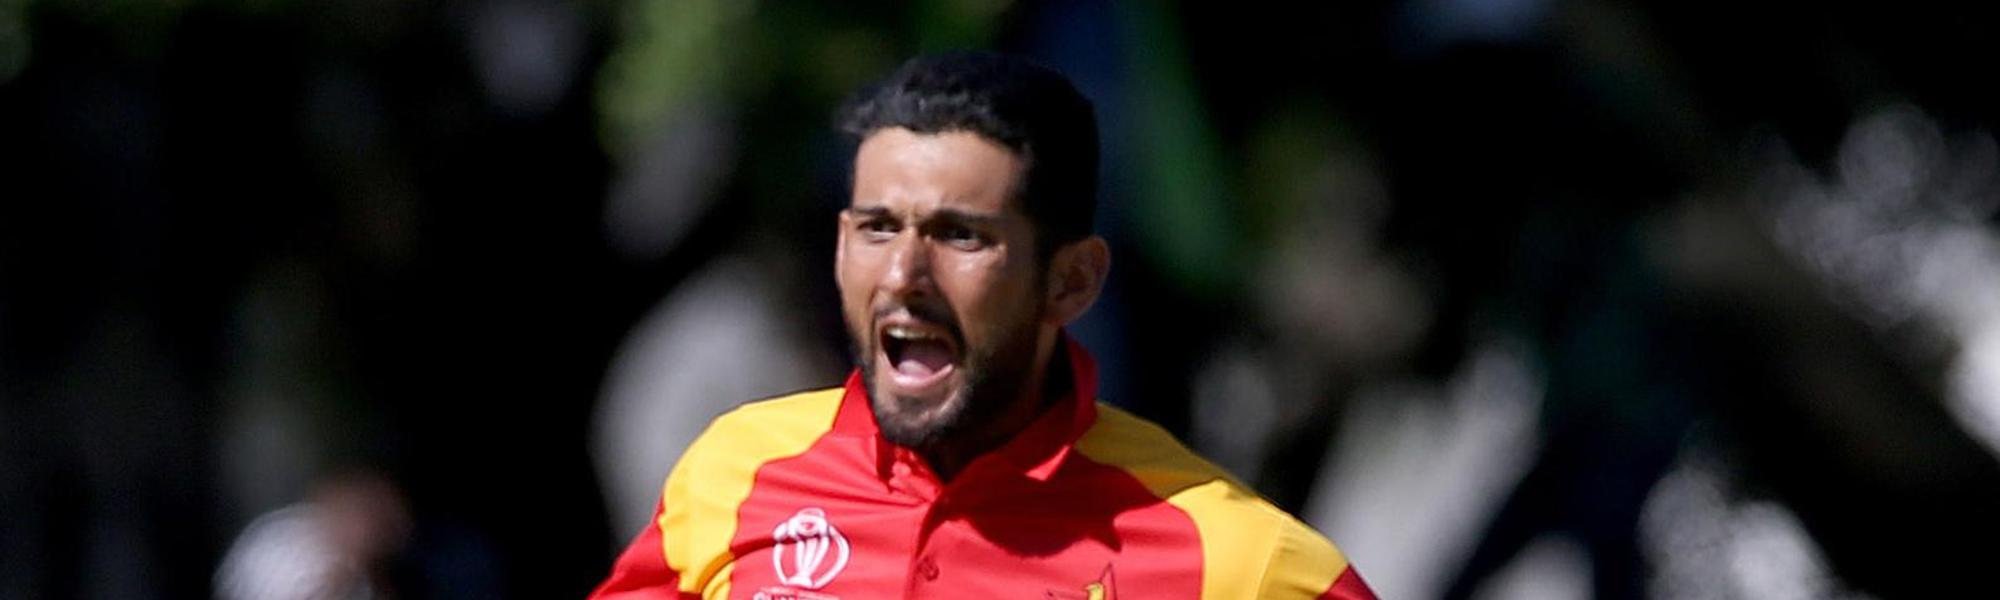 Sikandar Raza picked up key wickets to return 3/41